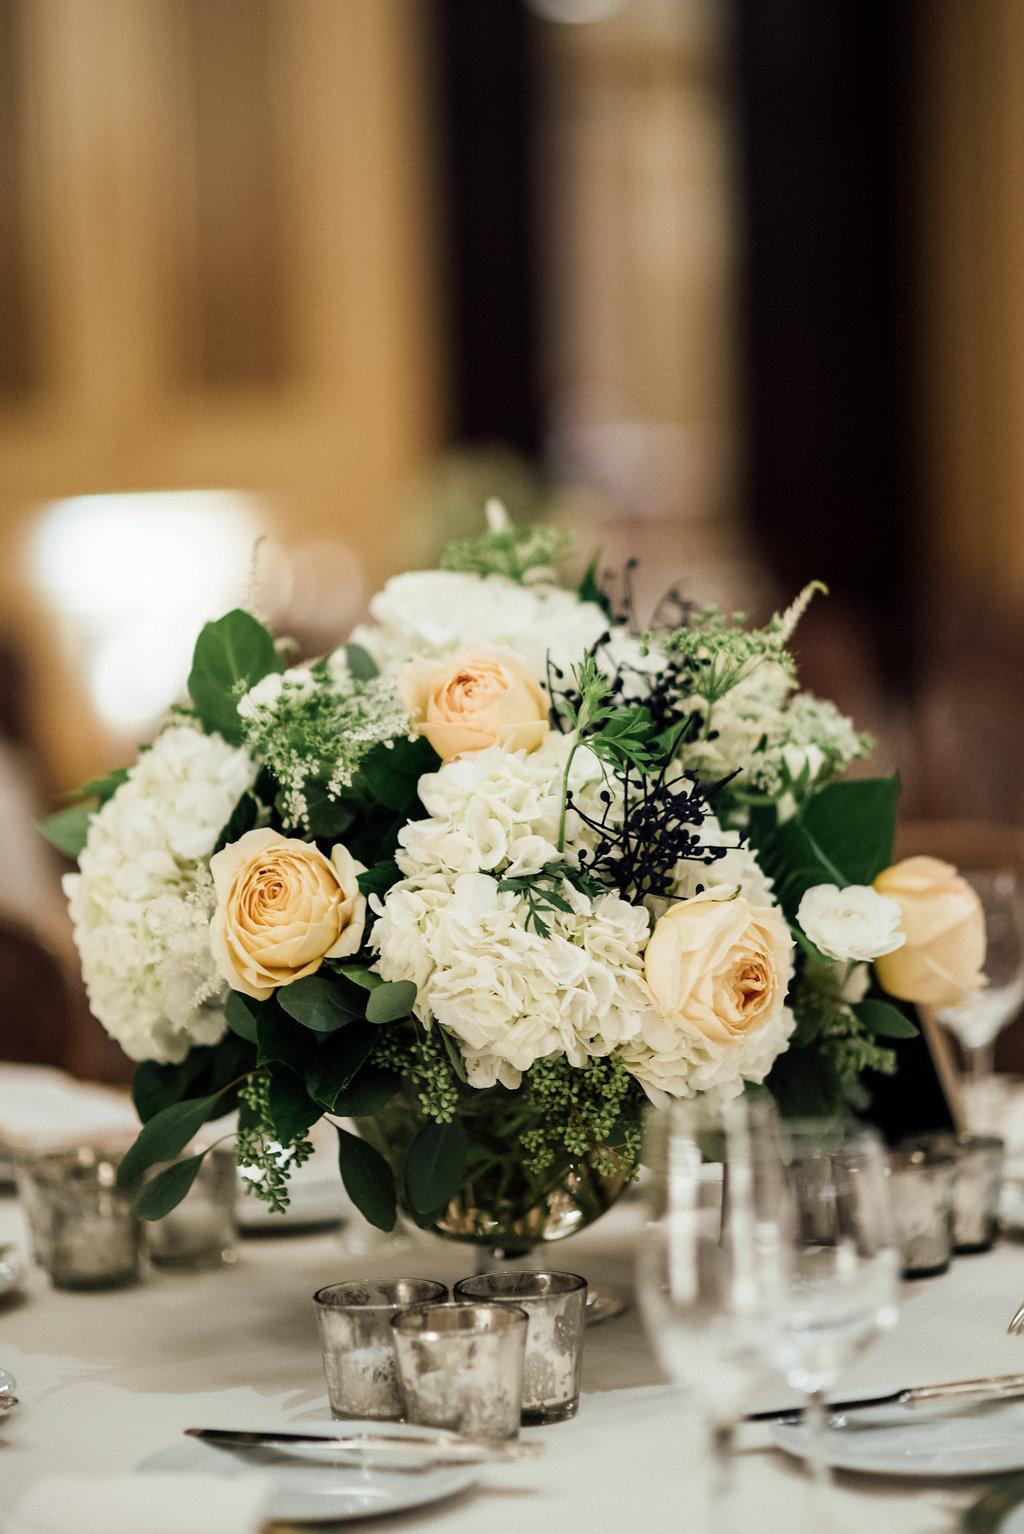 019 Hotel DuPont Gold Wedding Cake.jpg